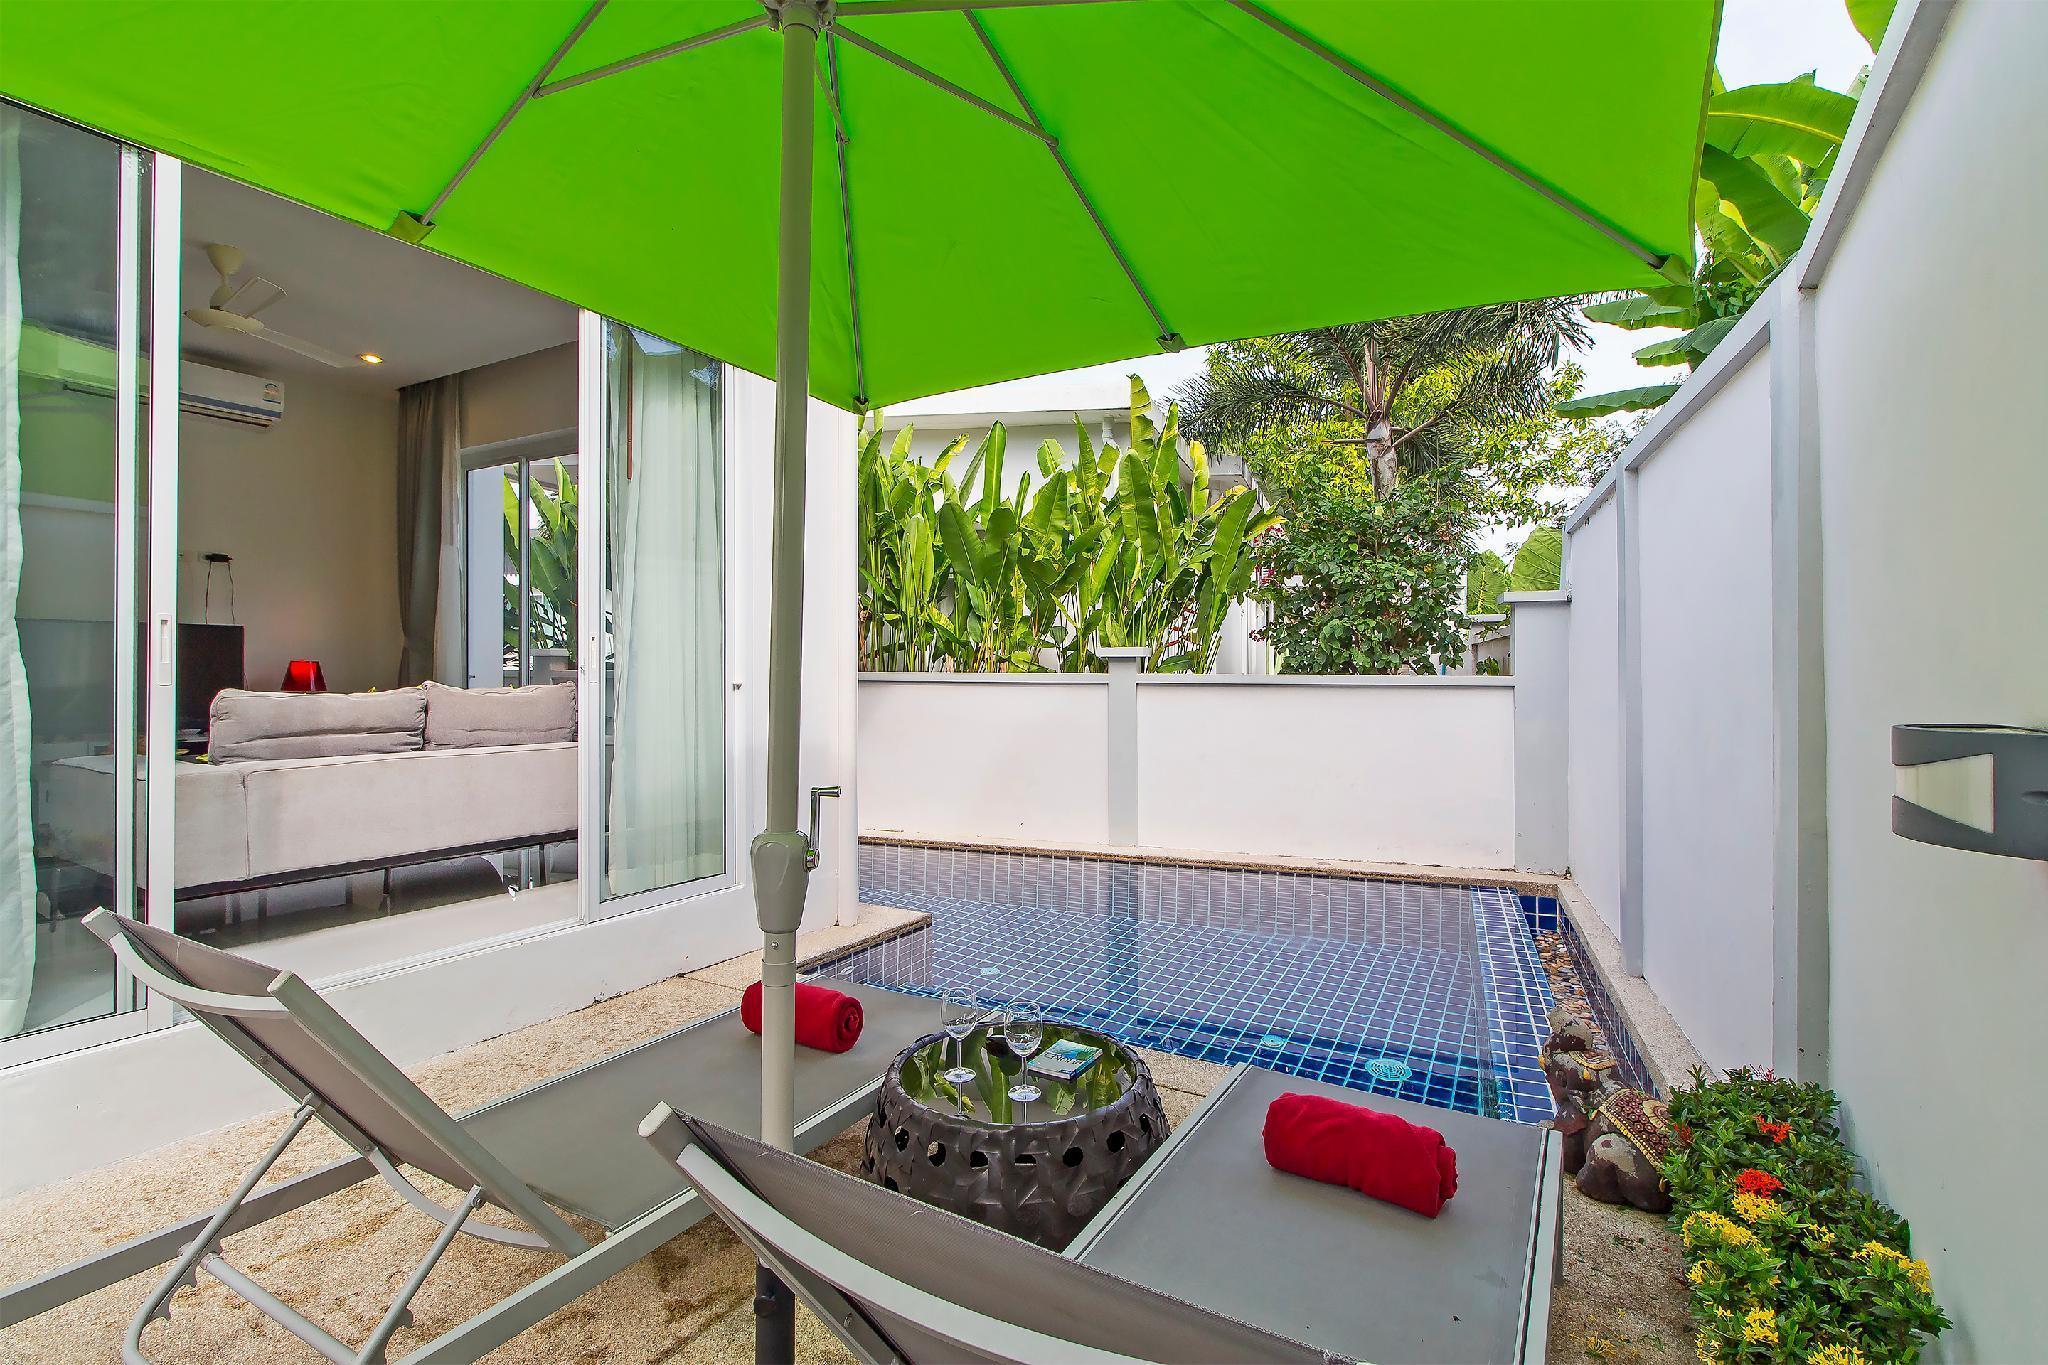 Villa Greens 6 - 2 Bedrooms & 3 Bathrooms - Rawai Villa Greens 6 - 2 Bedrooms & 3 Bathrooms - Rawai